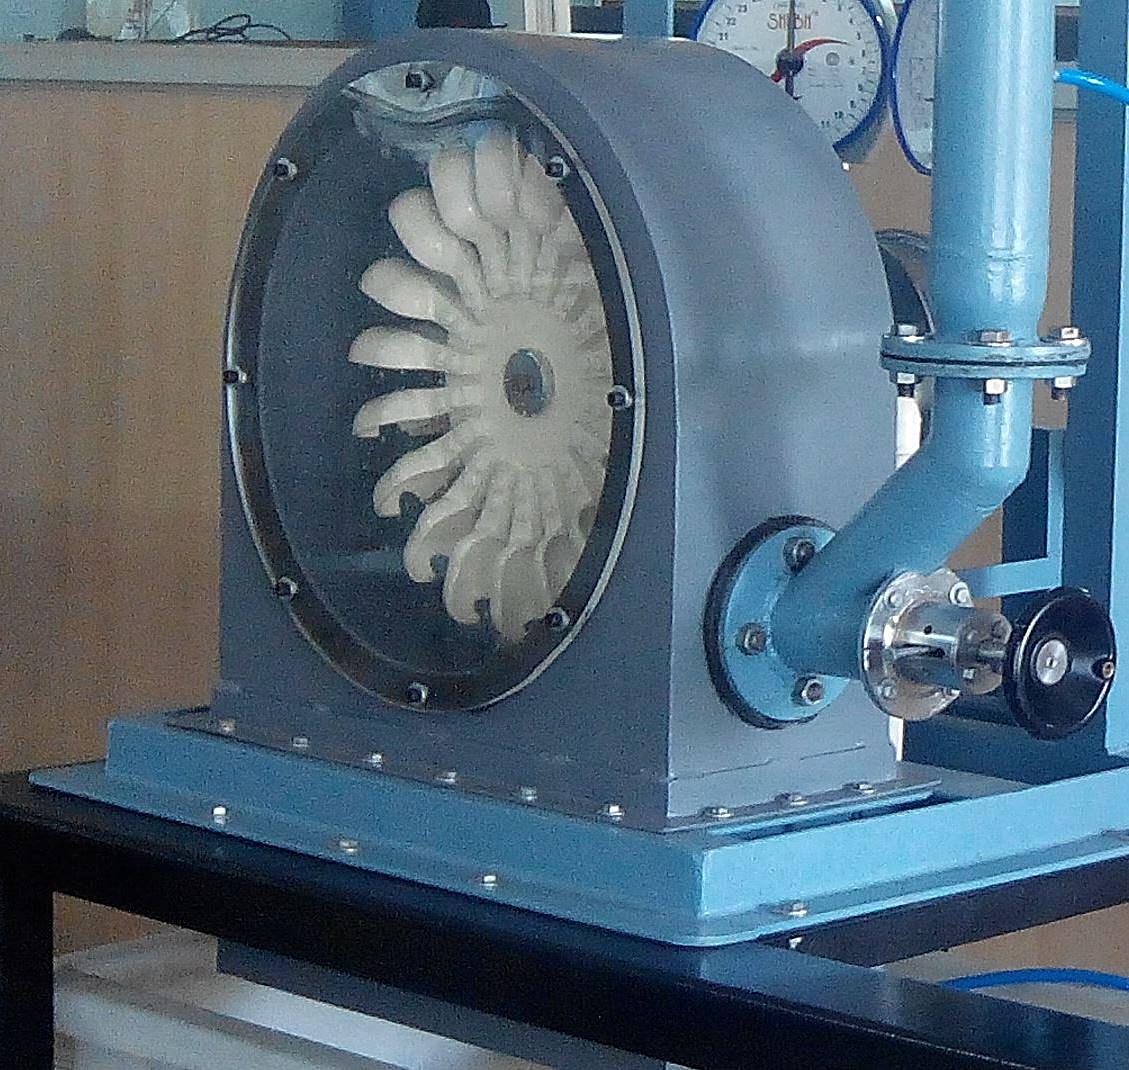 hydro turbine_edited